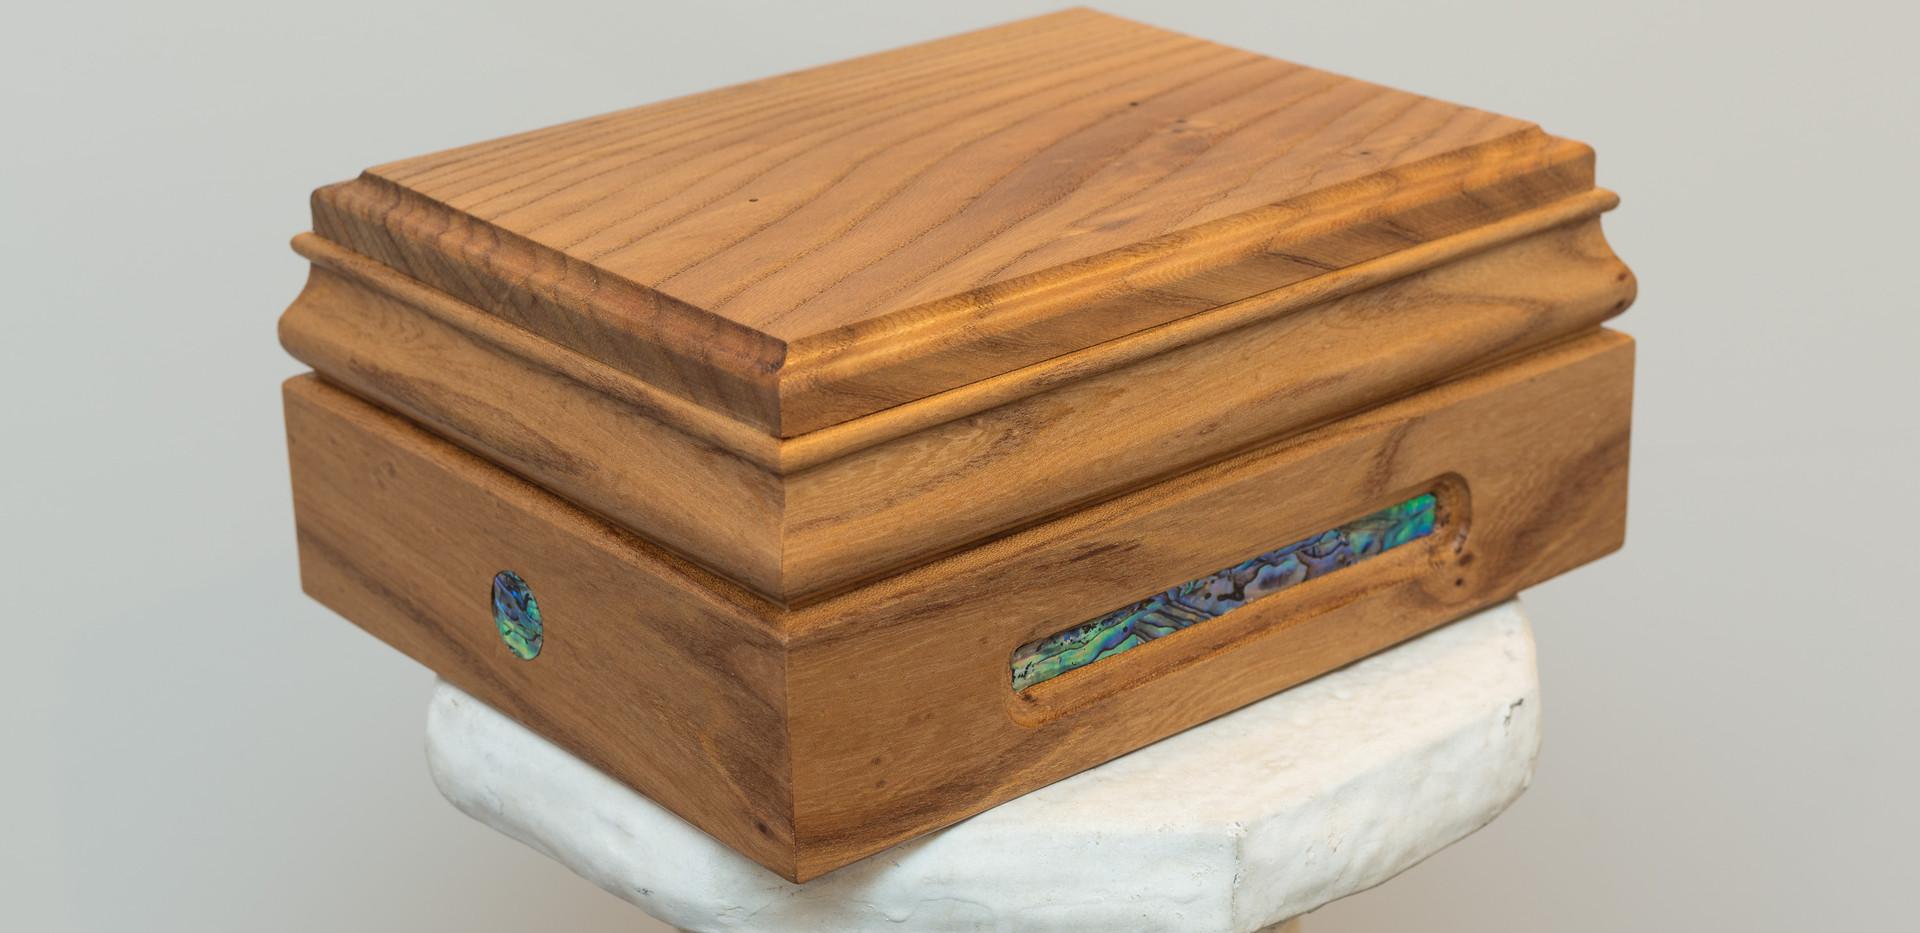 cremation urn 2 shone & shirley.jpg